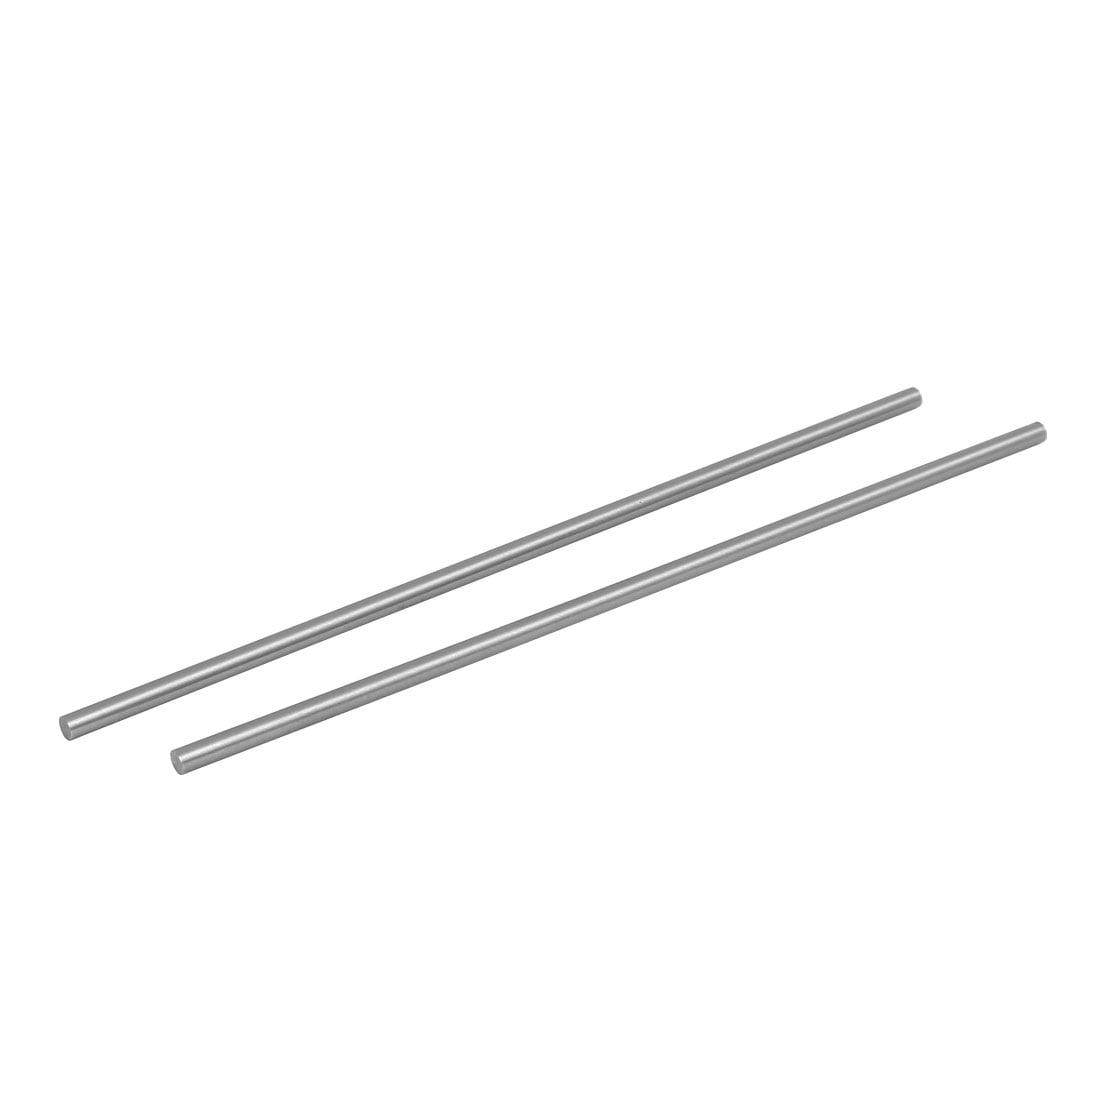 4.5mm Dia 200mm Length HSS Round Shaft Rod Bar Lathe Tools Gray 2pcs by Unique-Bargains